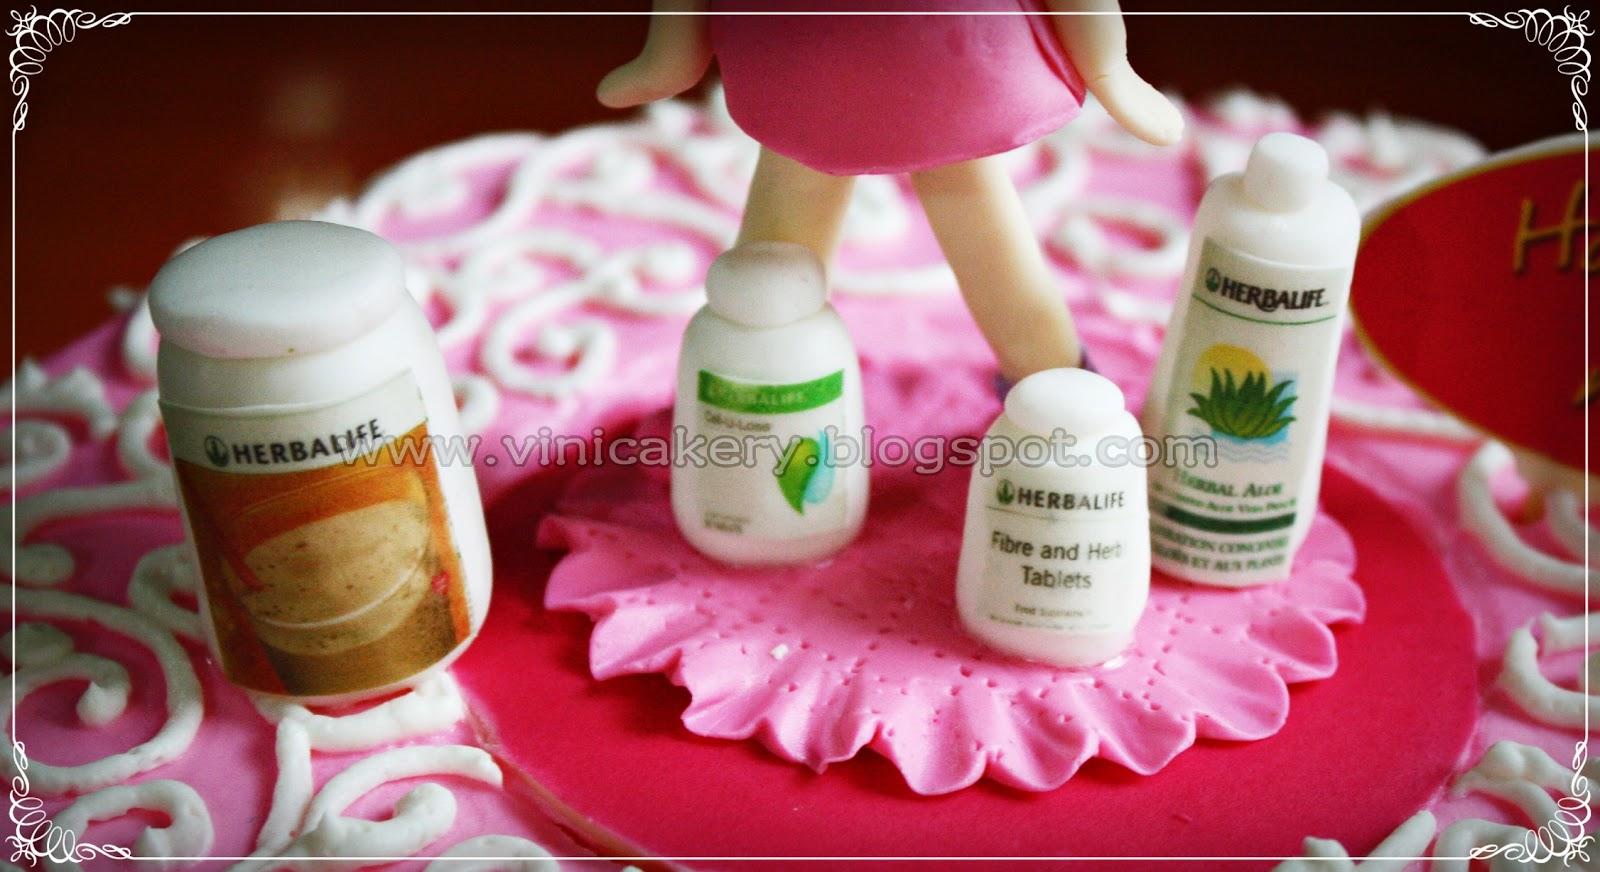 Wedding Cake Herbalife Shake Wedding Cake From Imacimages